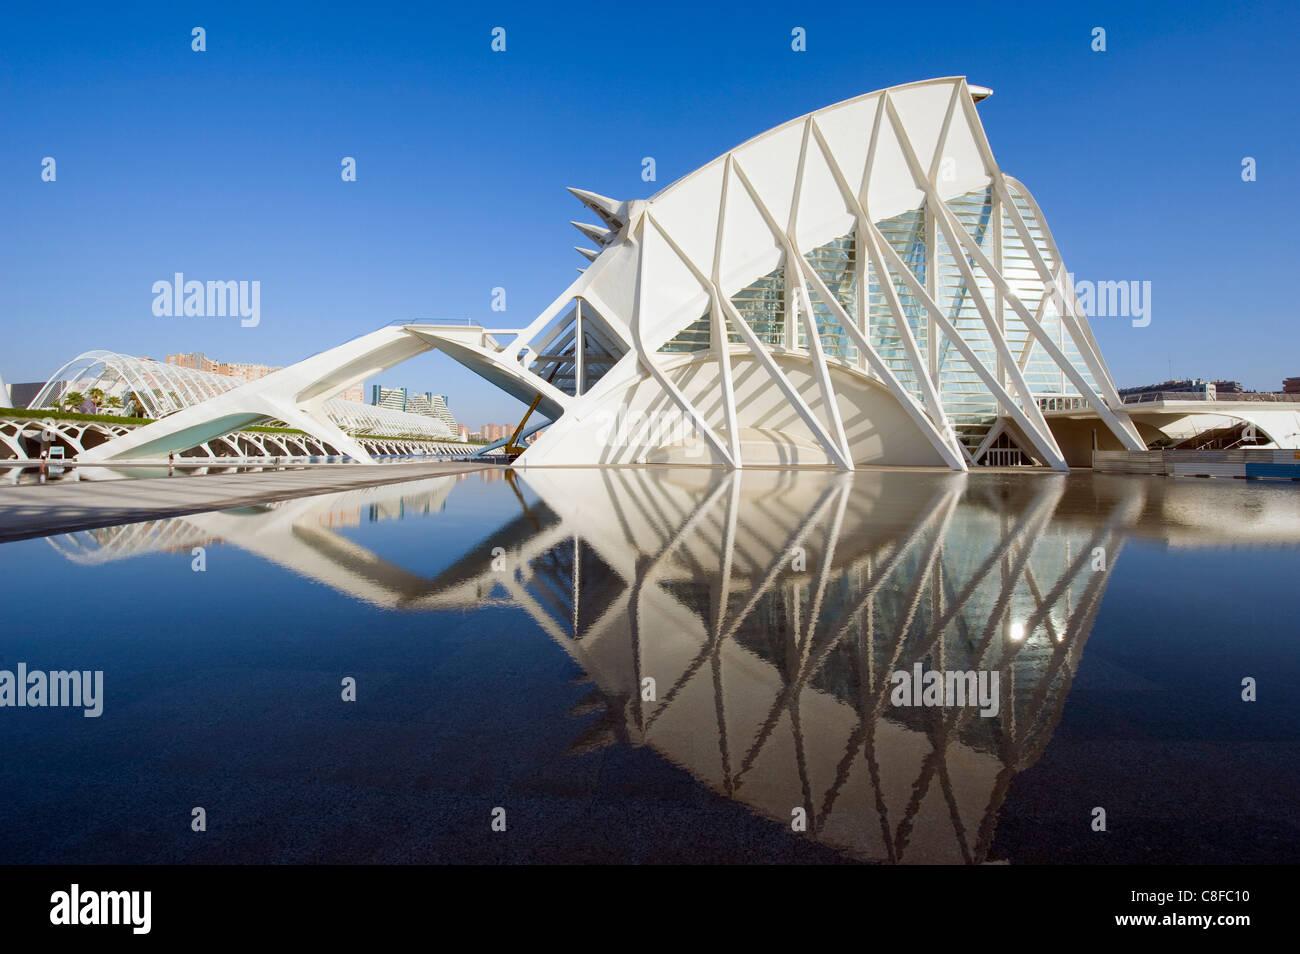 Science Museum, architect Santiago Calatrava, City of Arts and Sciences, Valencia, Spain - Stock Image